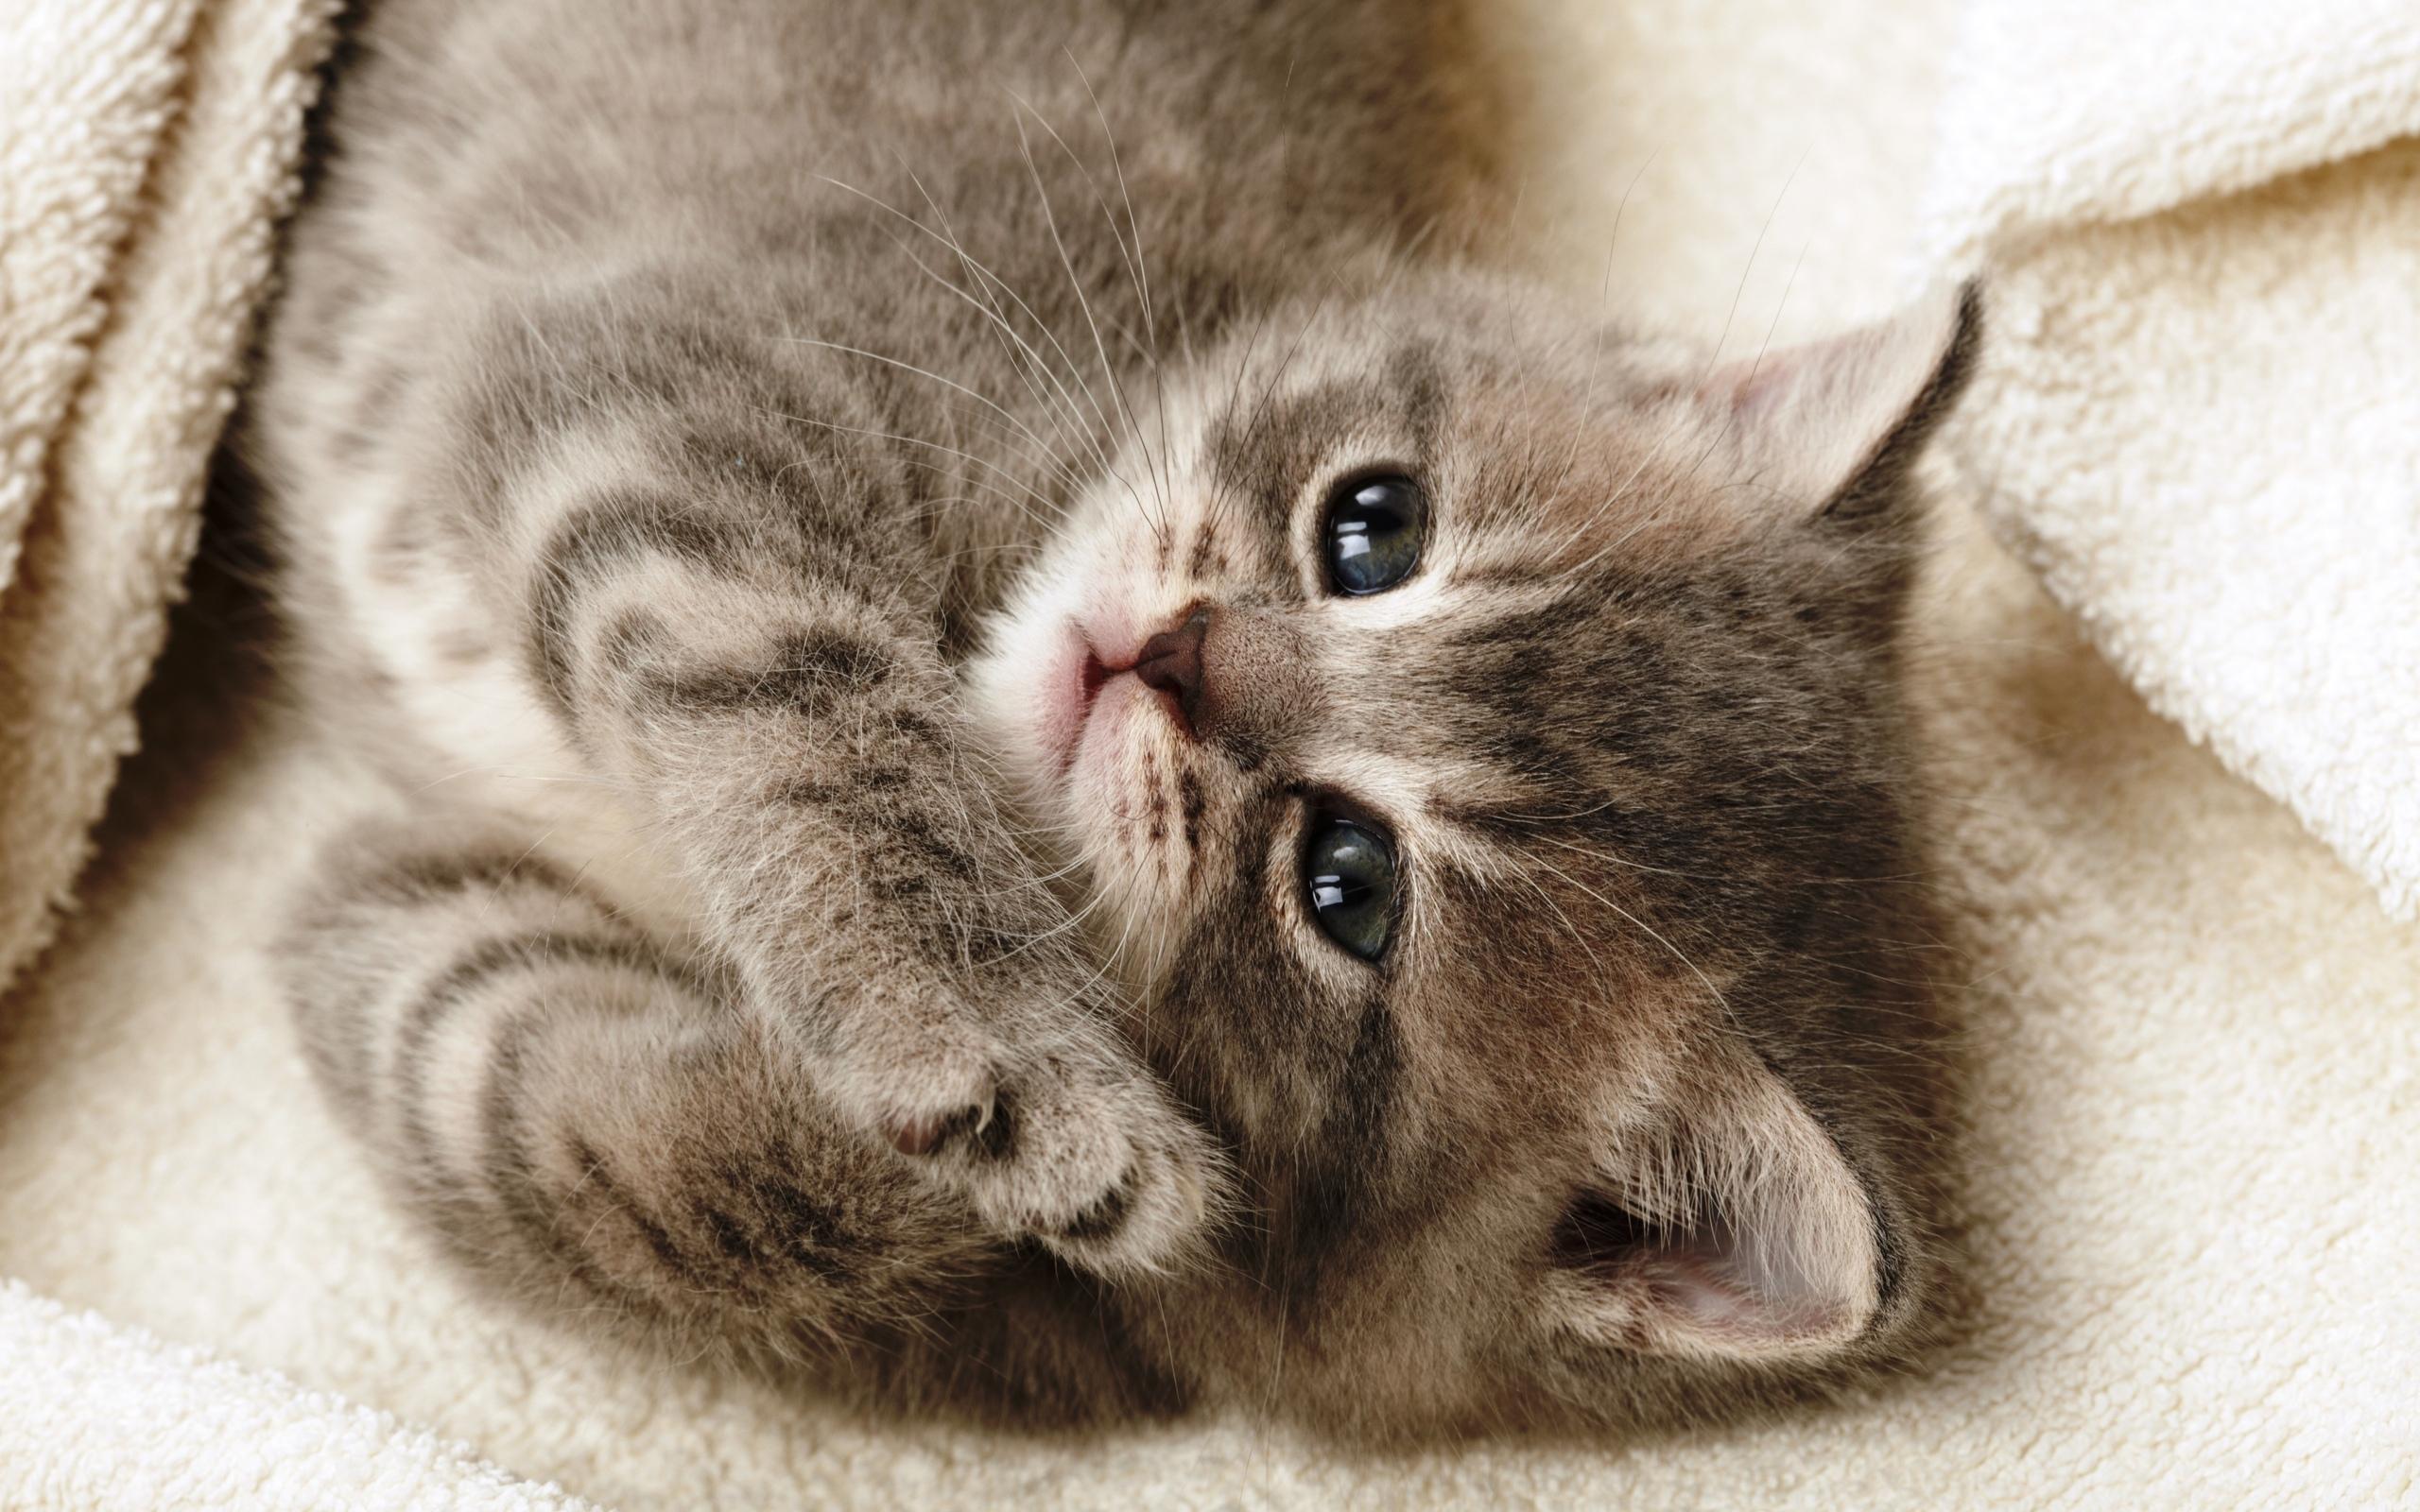 котенок дымчатый kitten smoky  № 2344390  скачать